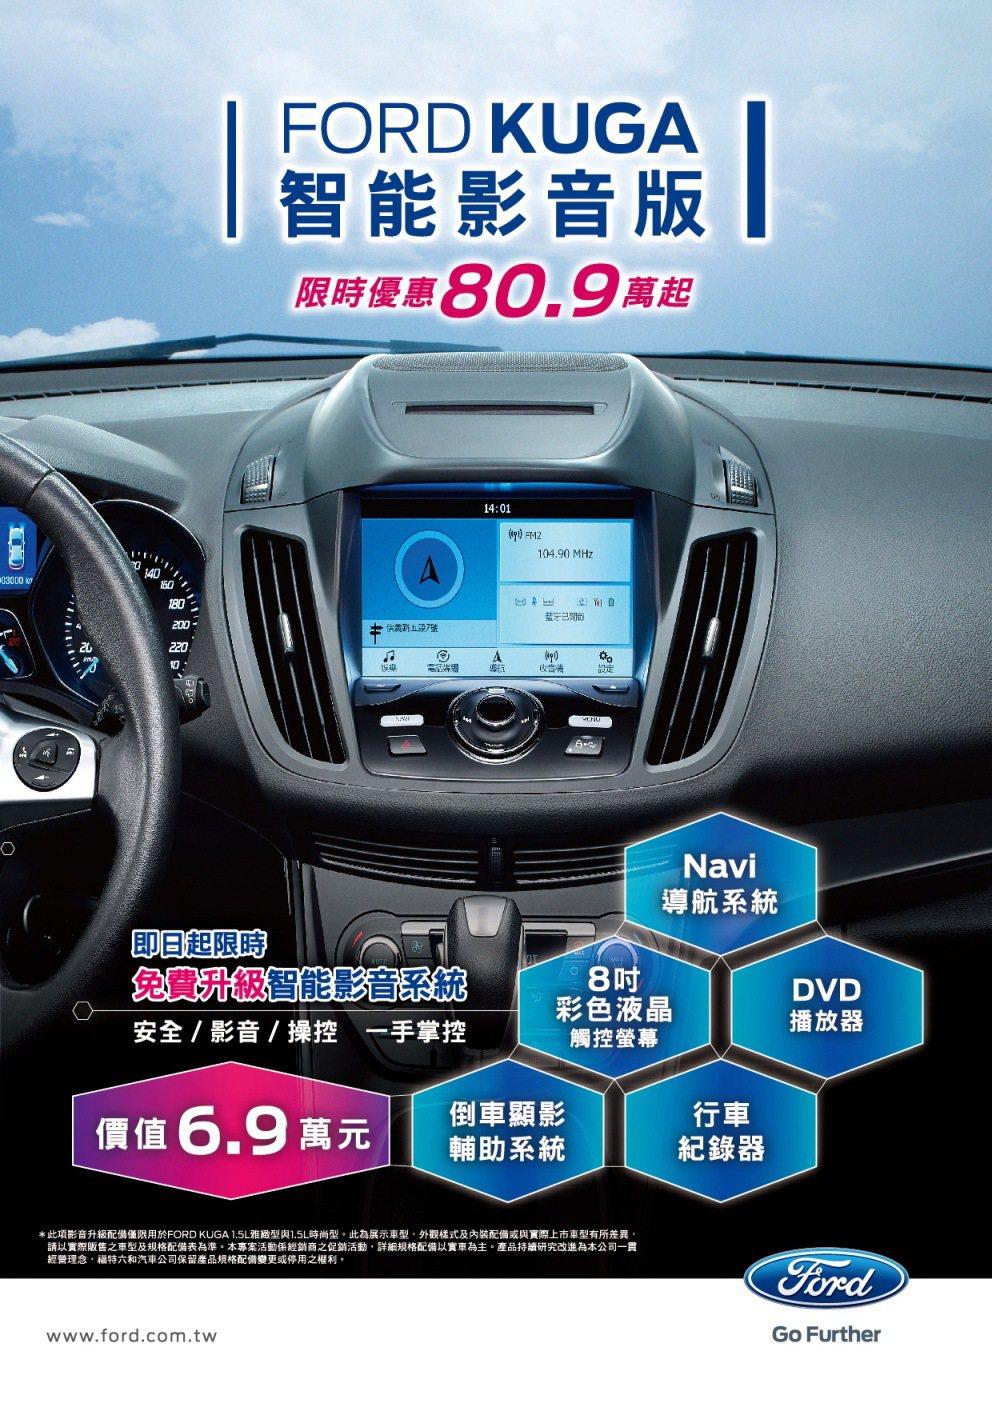 FORD於七月份起推出「Ford Kuga智能影音版」,總價值高達新台幣6.9萬...